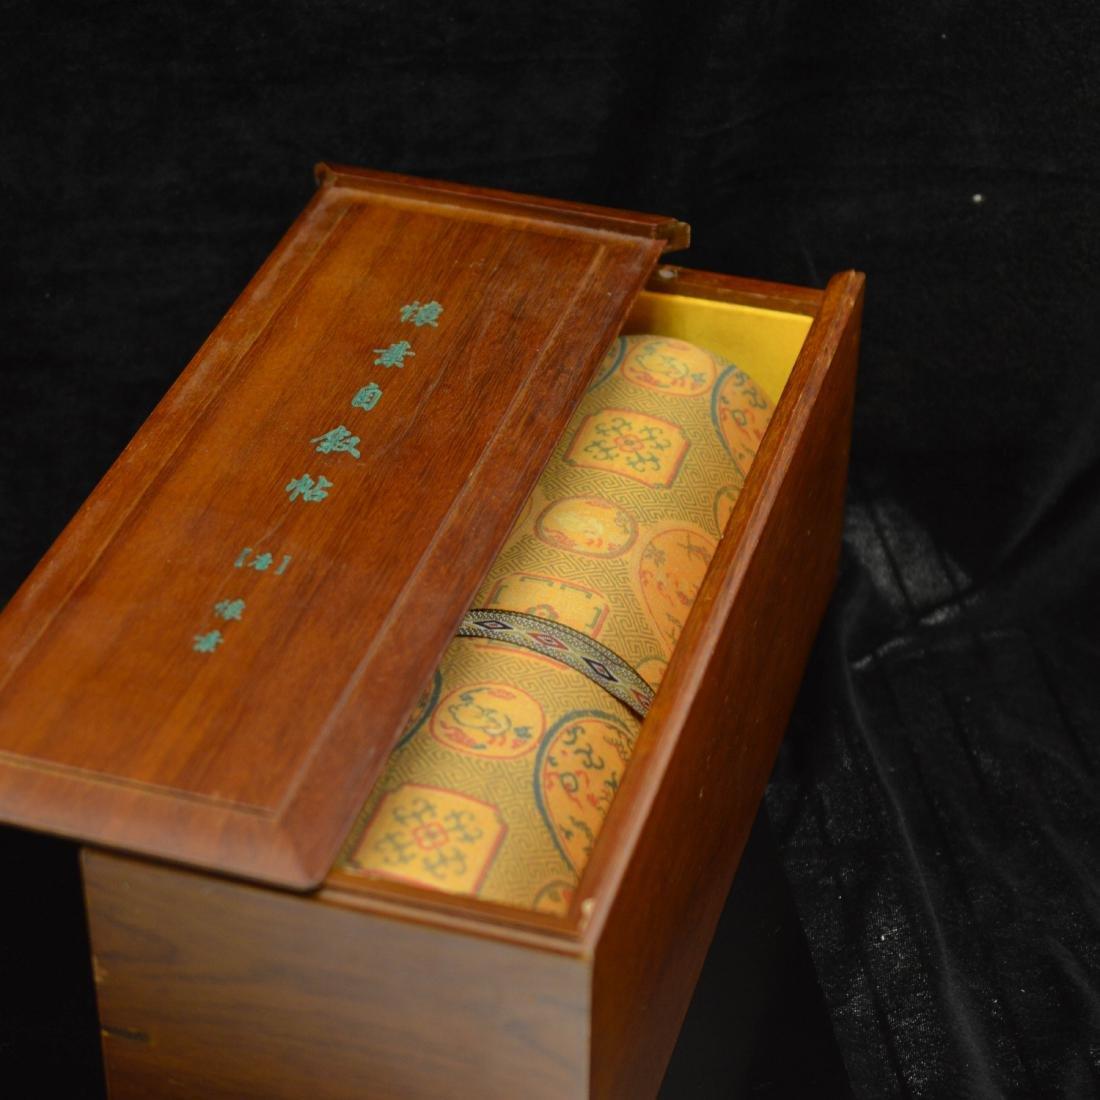 Huai Su's autobiography with box